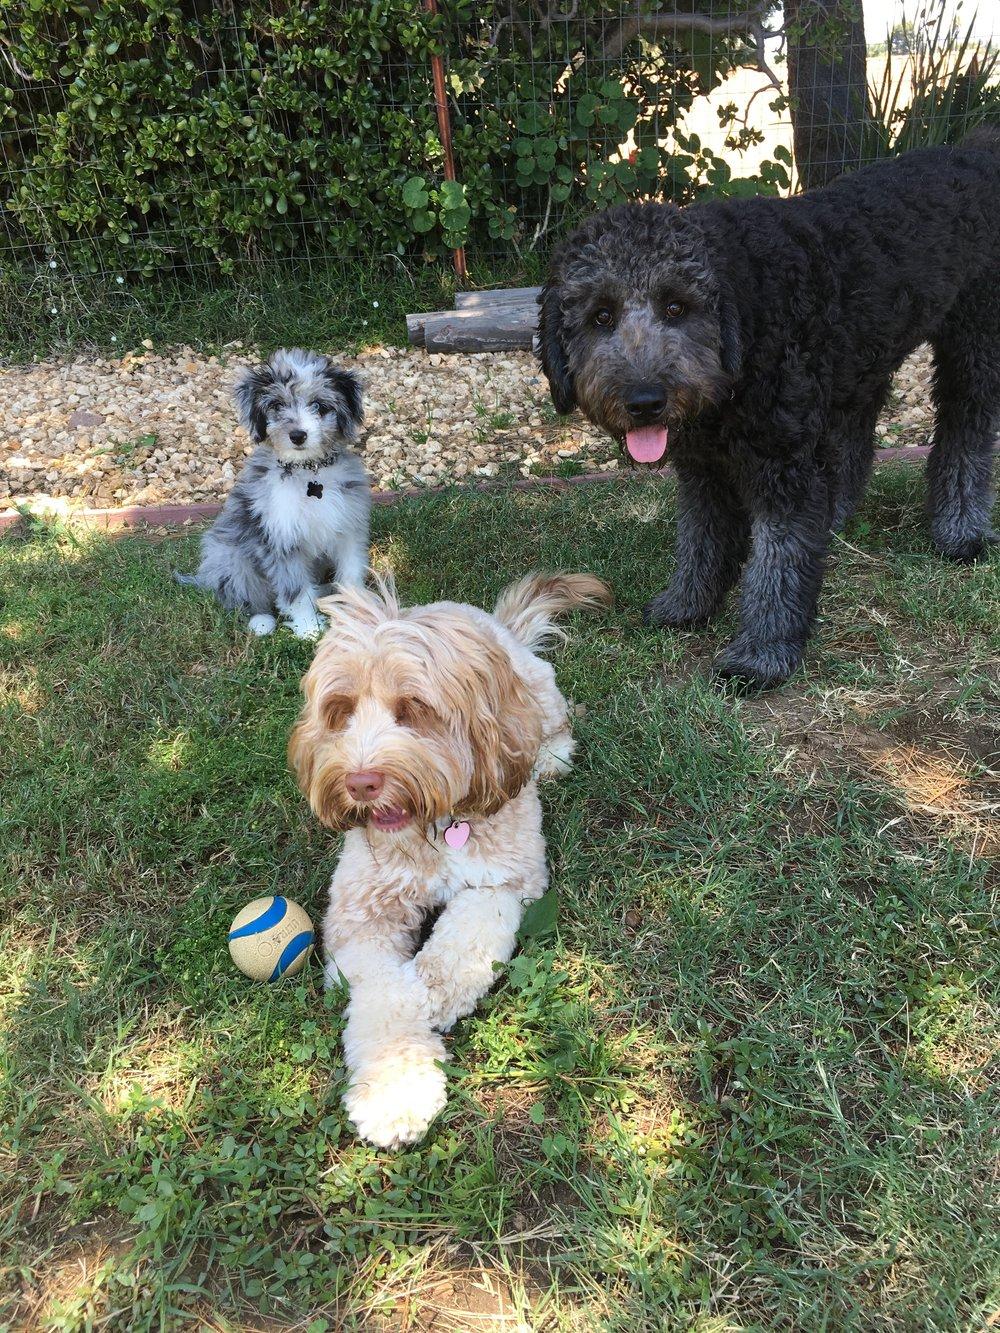 Dogpanion Puppy Boarding School Dogpanion Private Dog Training